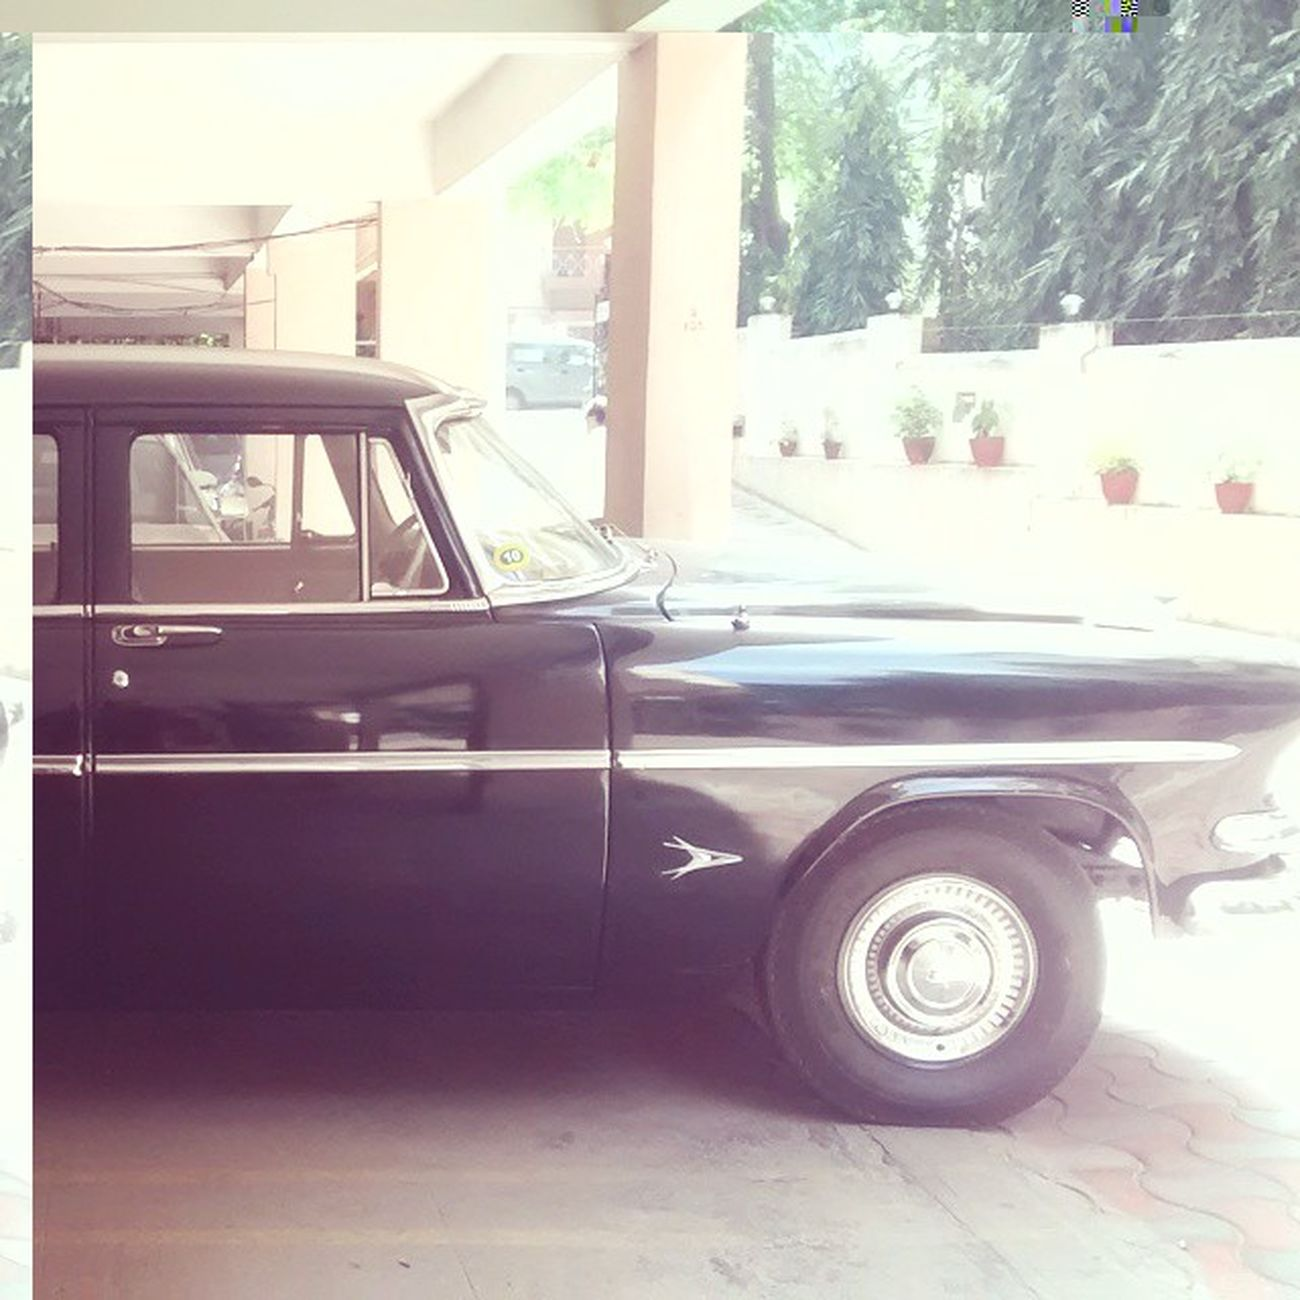 Dodge Kingsway Vintage Oldisgold Cars Instago Instalike Instagold Instafollow Instafamous